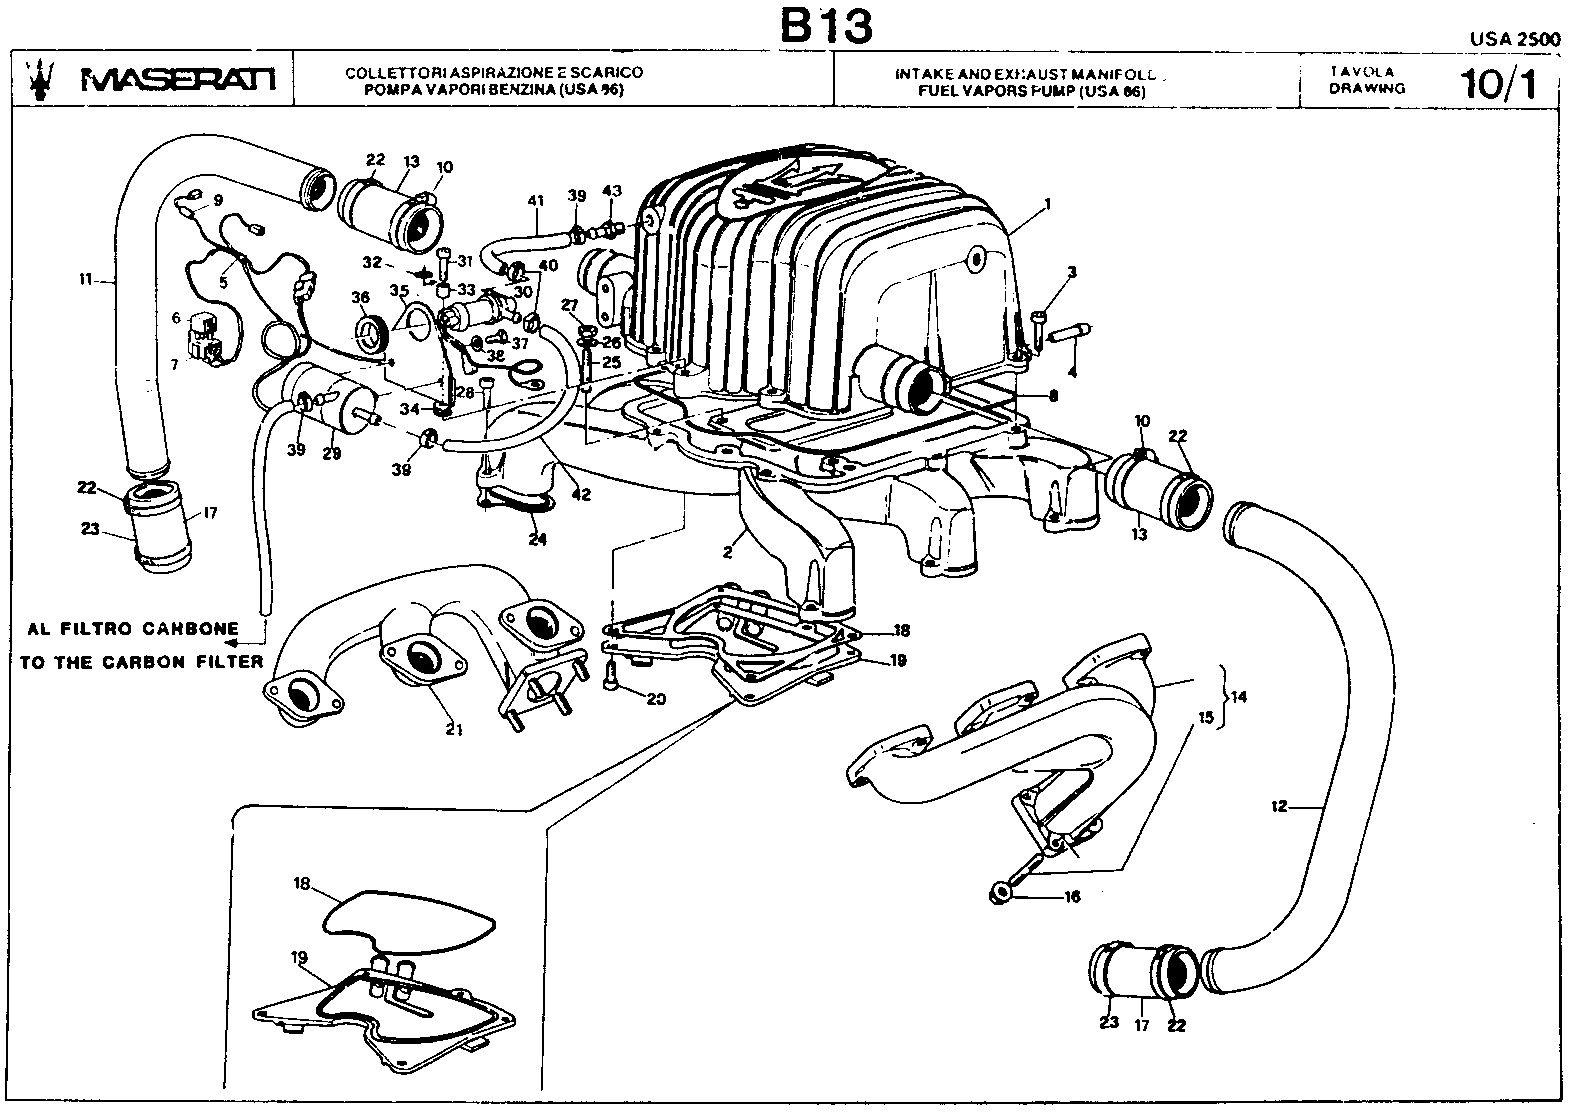 hight resolution of wiring diagram on maserati biturbo wiring as well maserati biturbo